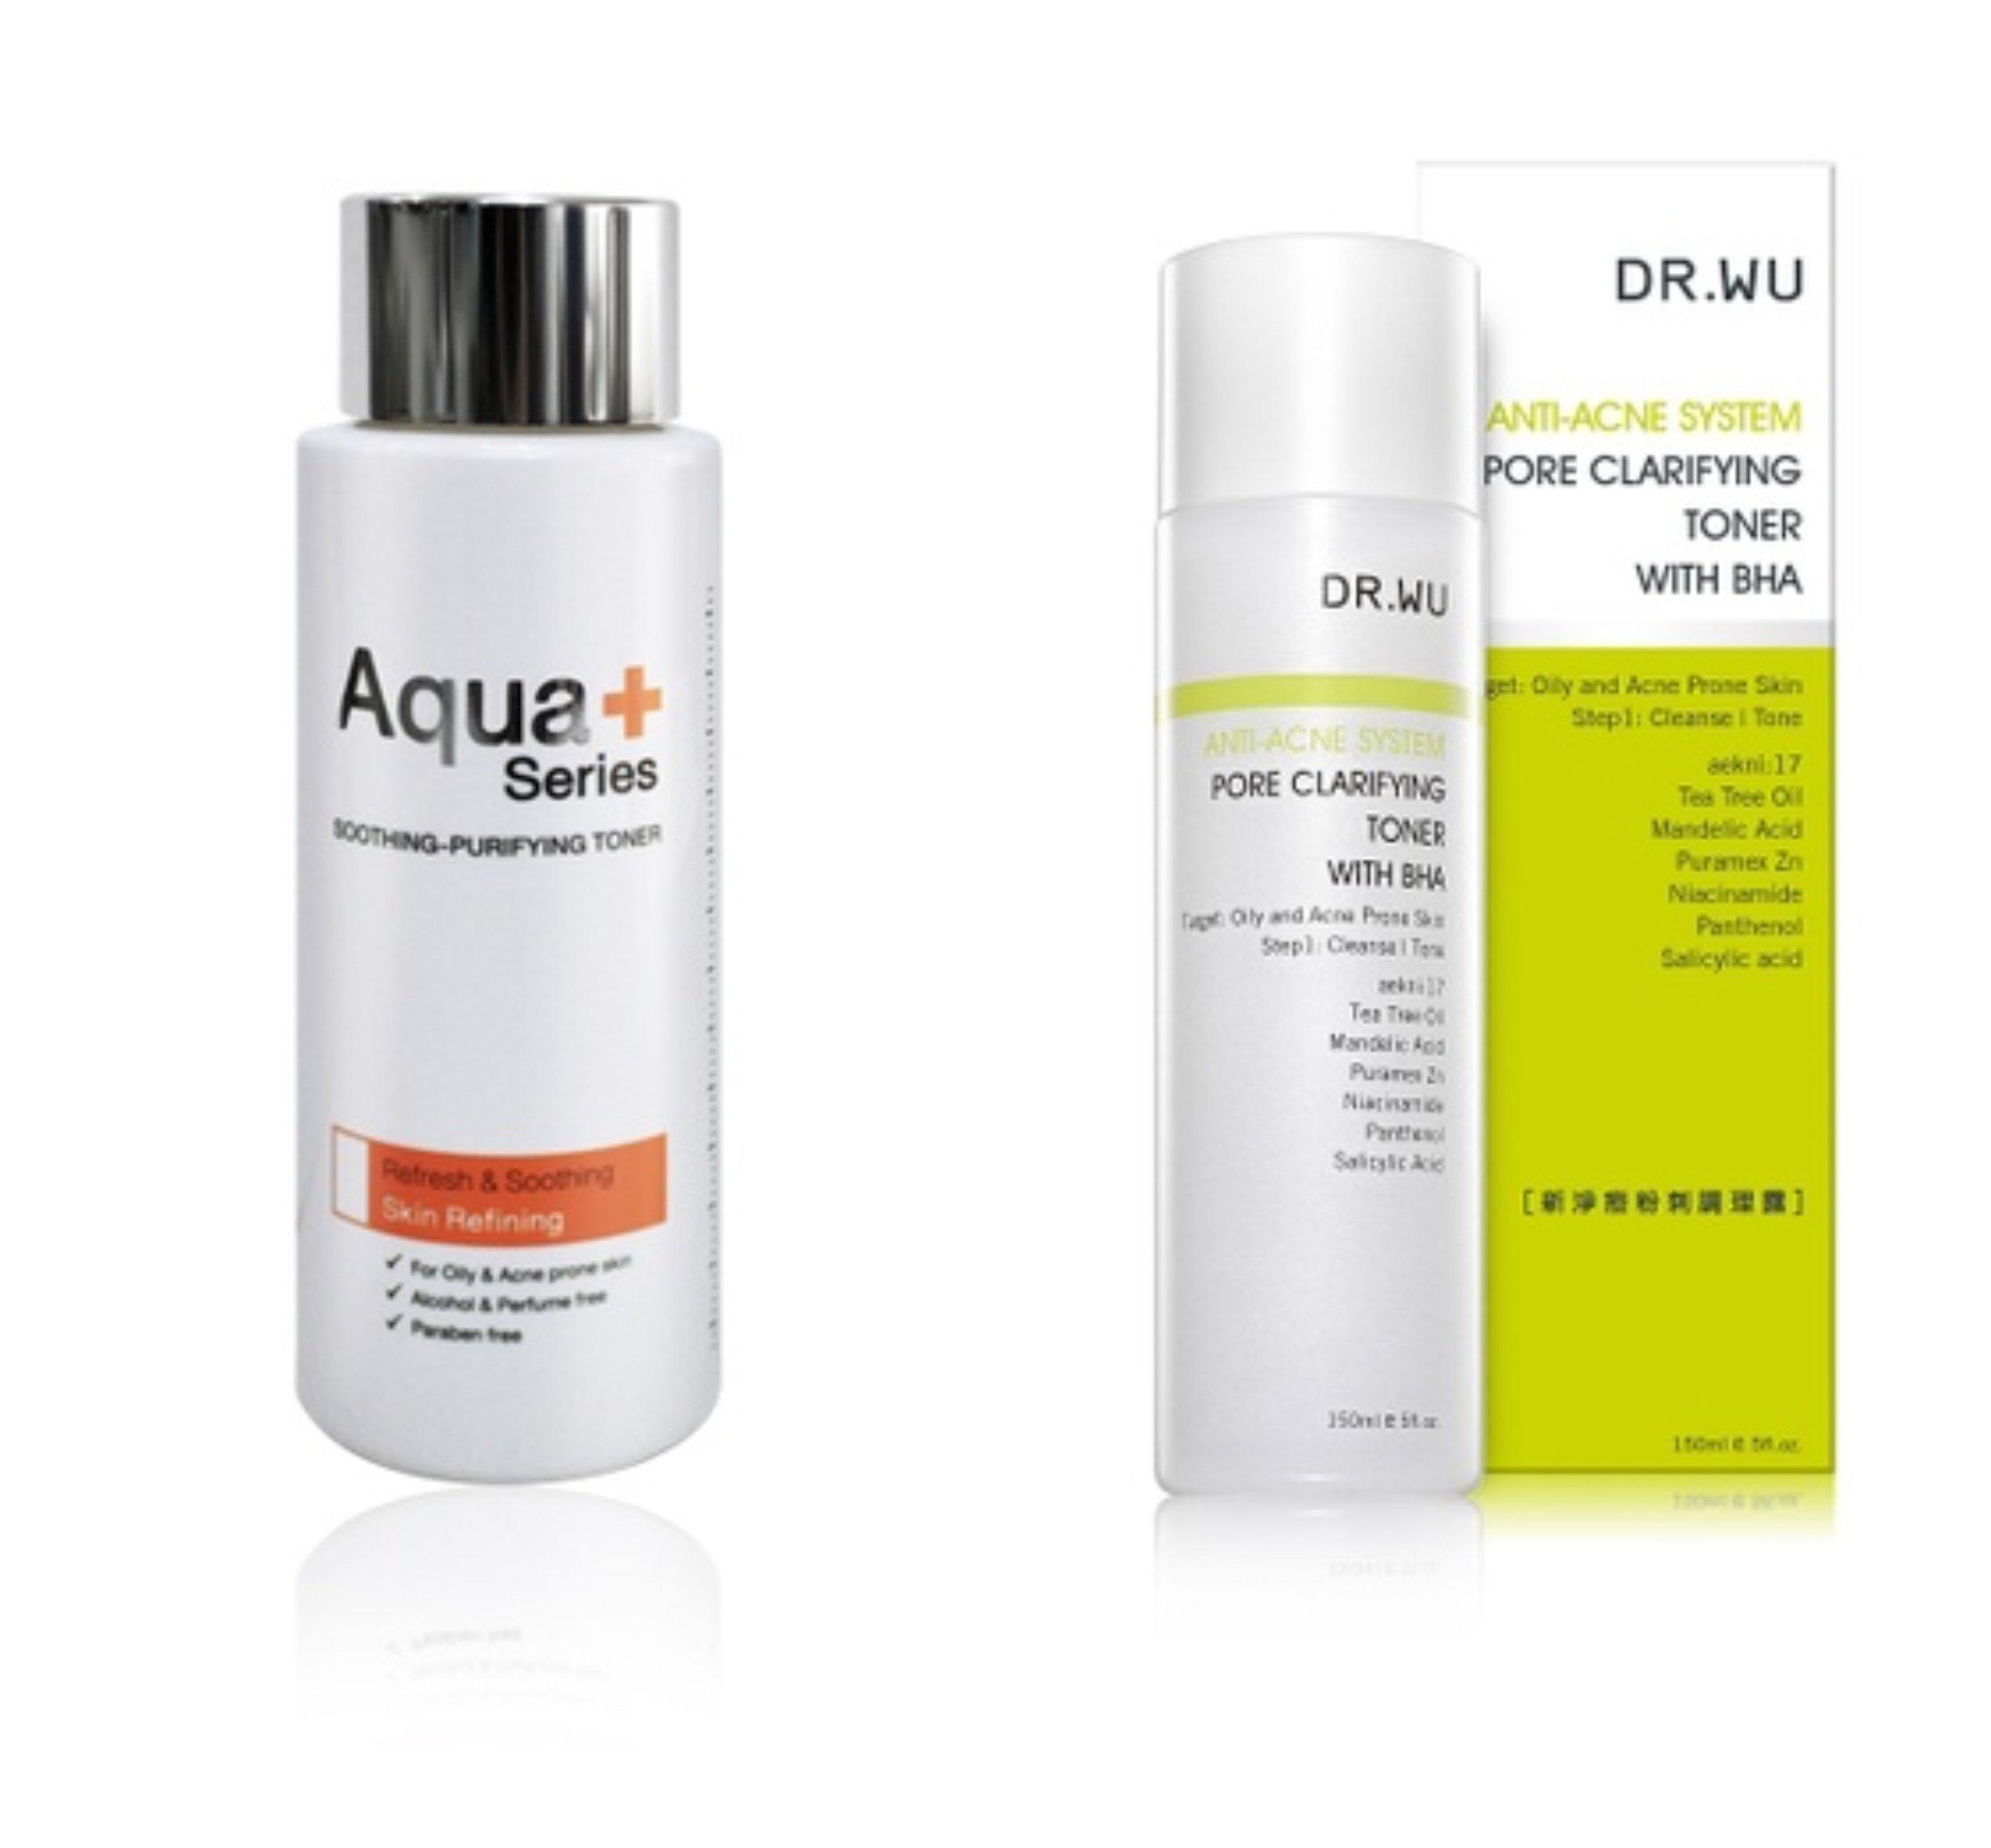 Aqua+ Series Purifying Toner     DR.WU Pore Clarifying Toner With BHA